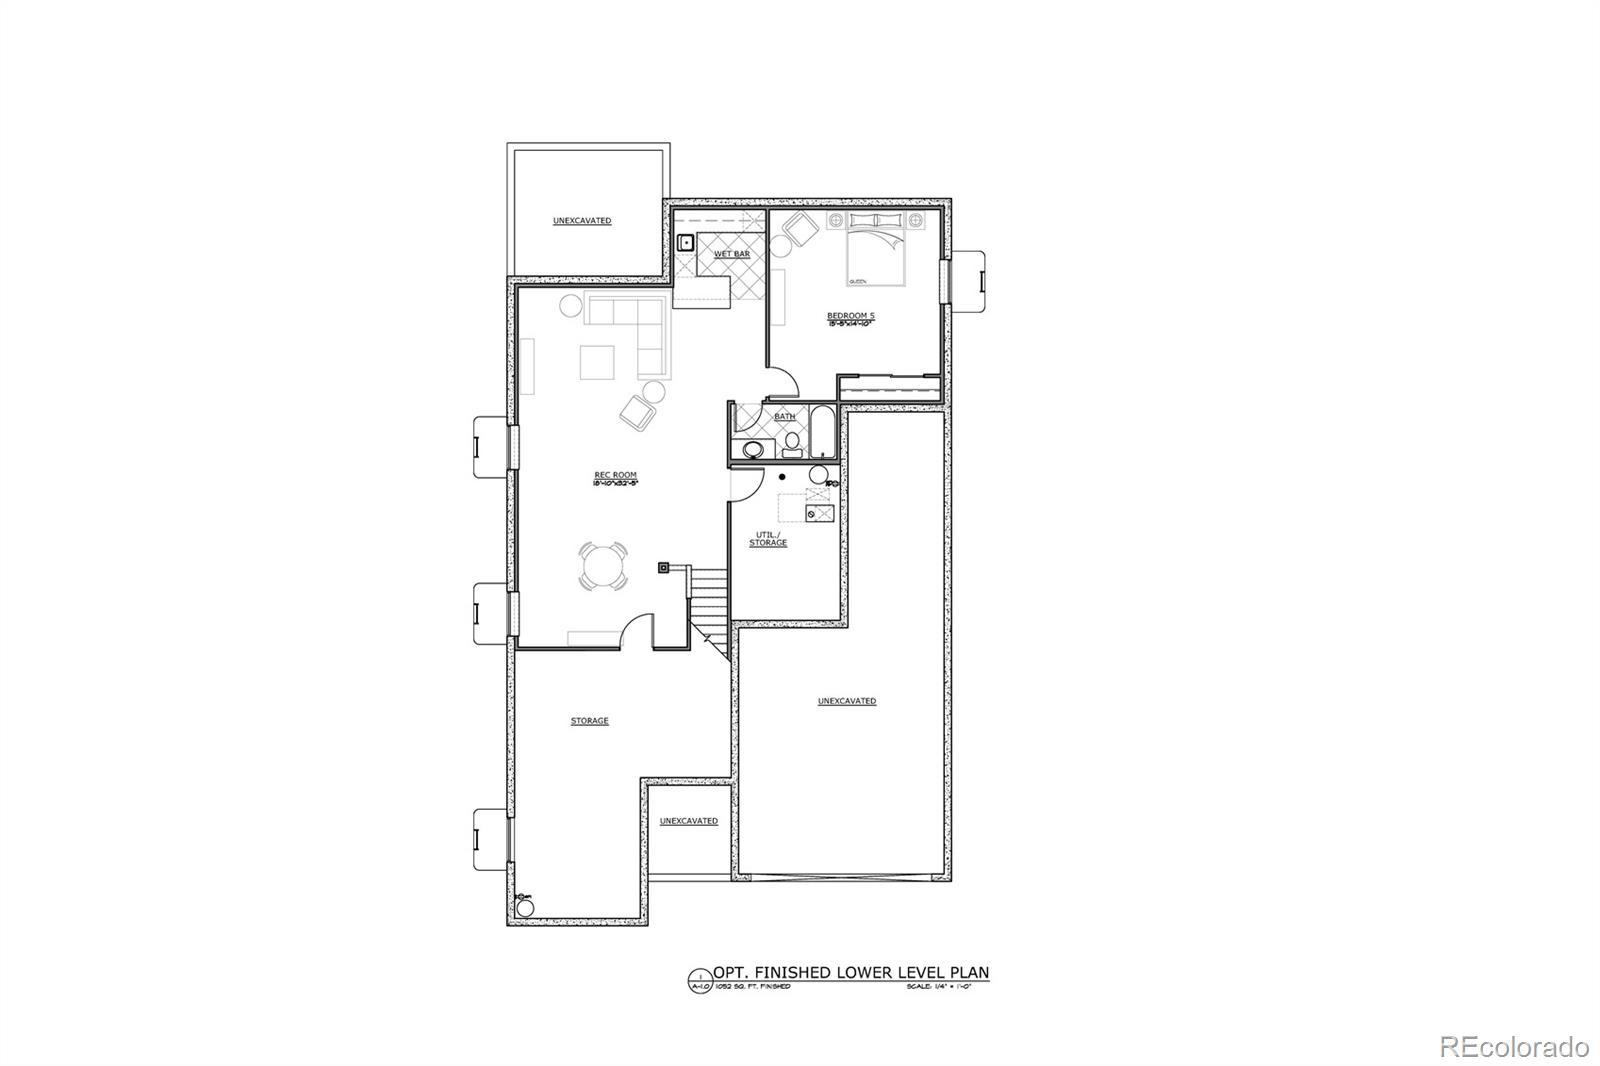 MLS# 3110499 - 3 - 4420 Fox Grove Drive, Fort Collins, CO 80524